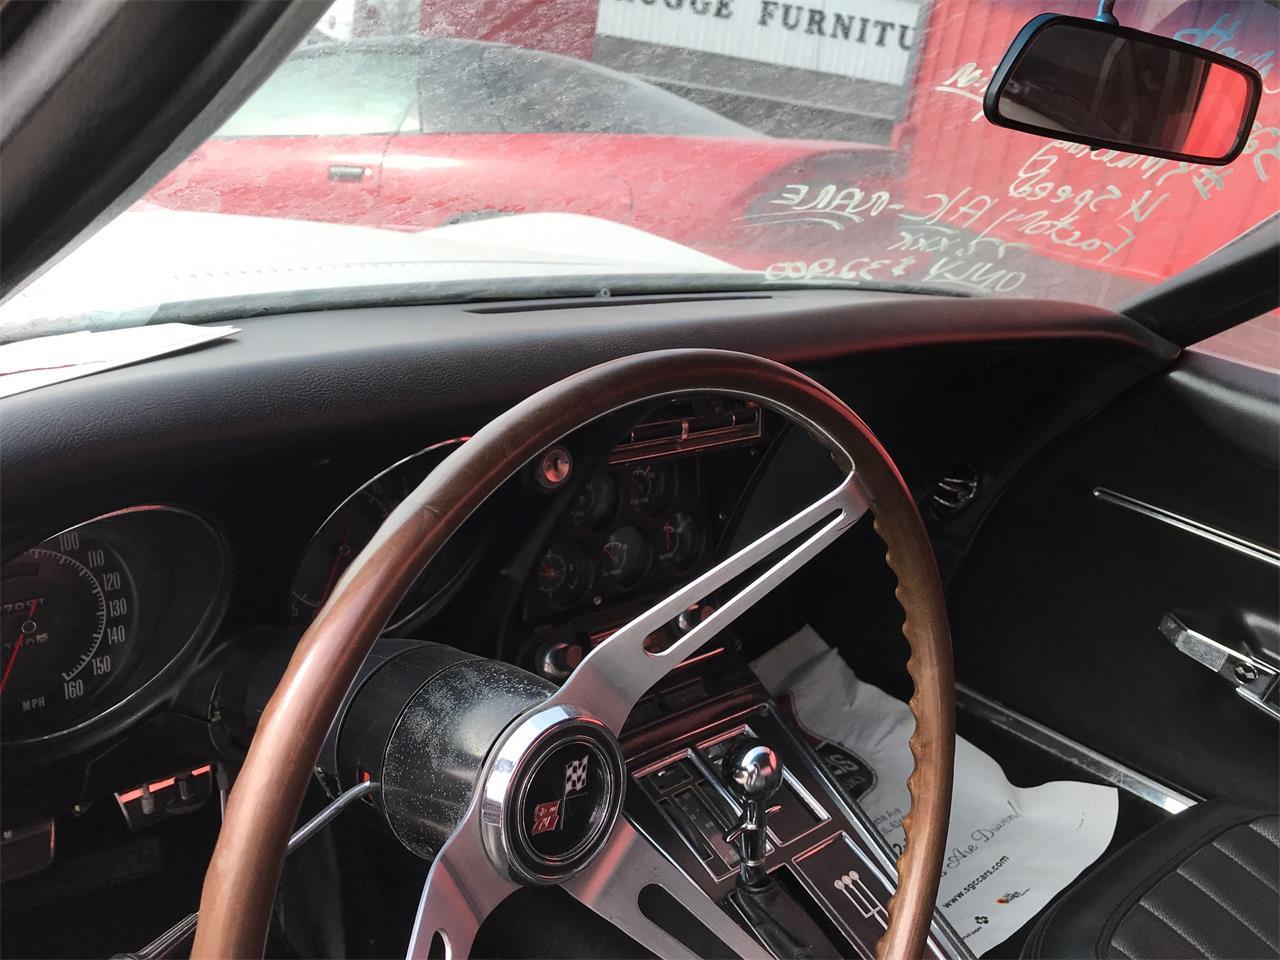 Large Picture of Classic 1968 Chevrolet Corvette located in Effingham Illinois - $32,900.00 - IINV